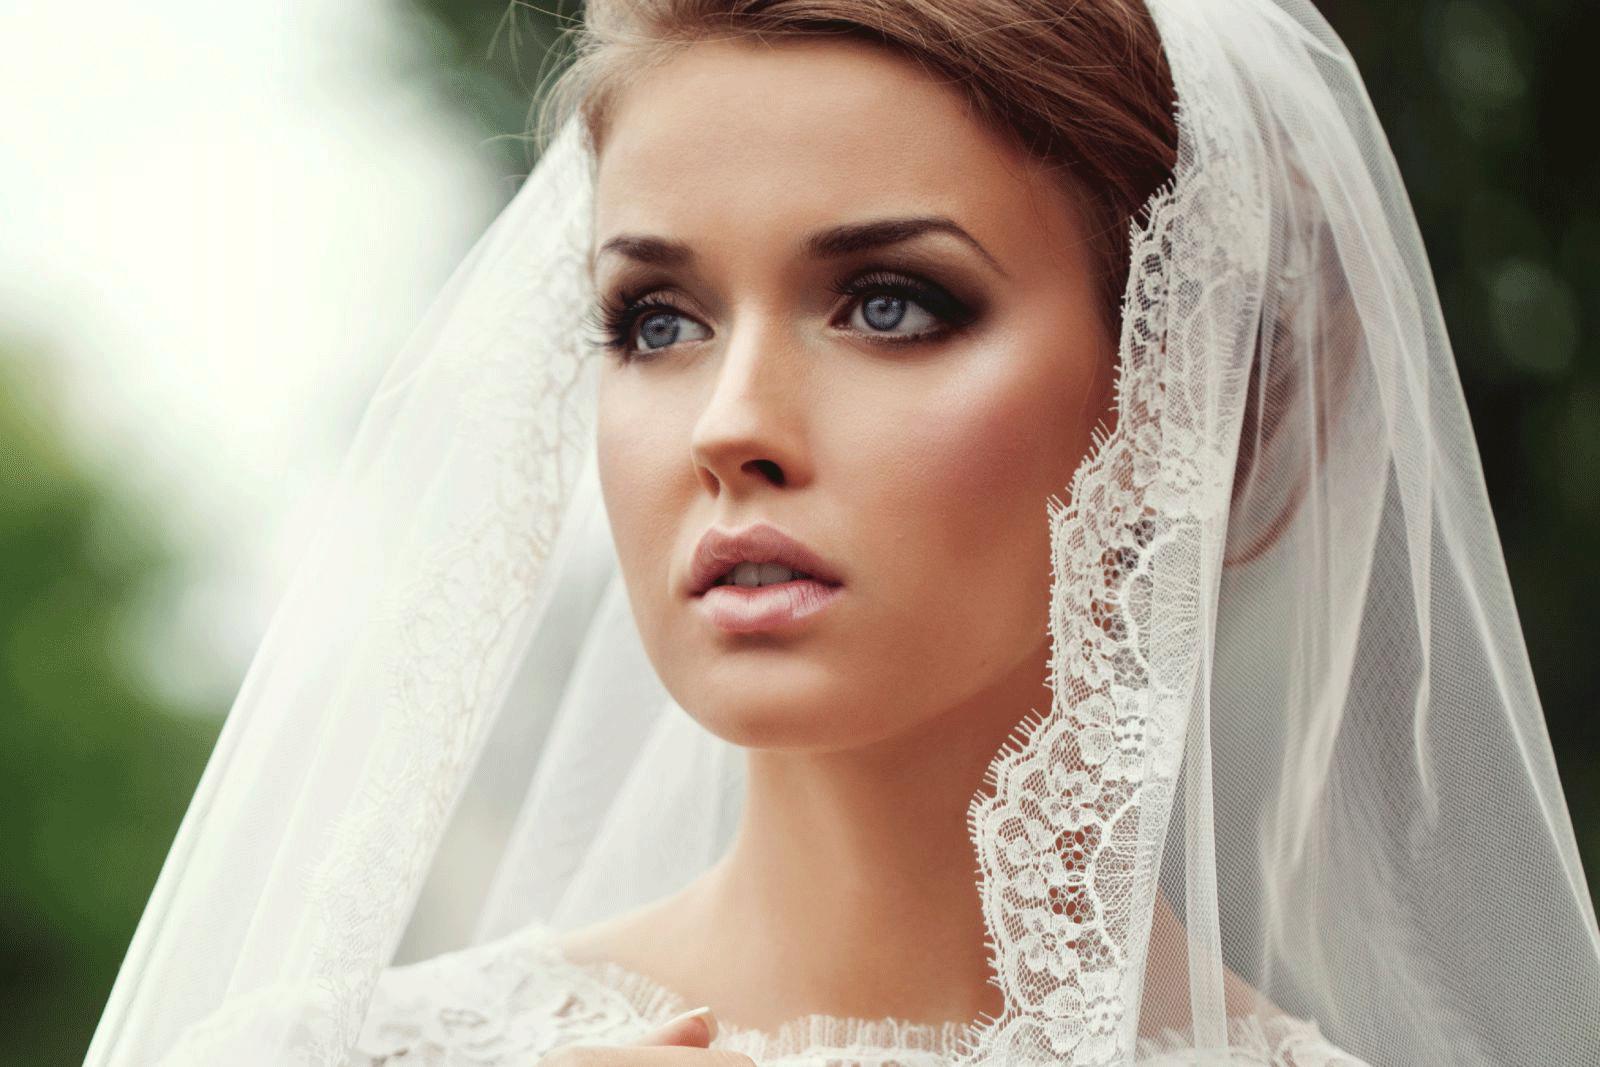 beauty-wedding-makeup1600-x-1067-712-kb-png-x